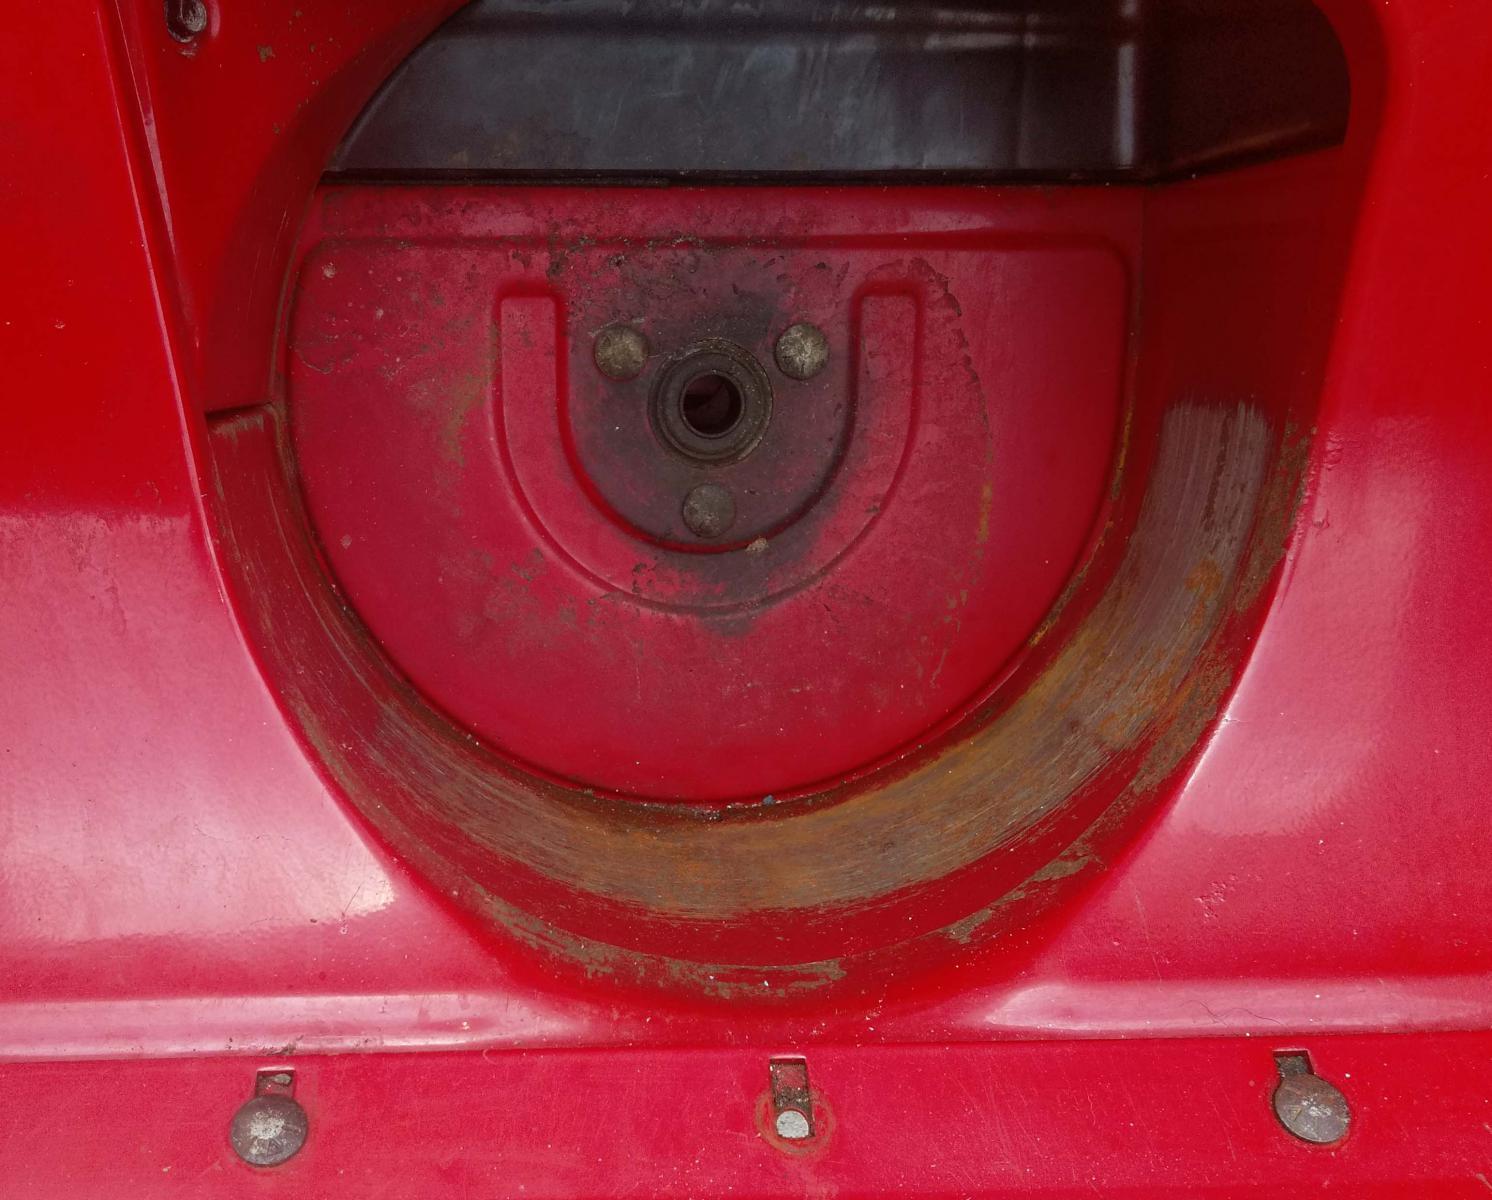 Toro Powermax Rusted shaft, impeller - add zerk fitting ?-imag0808-2.jpg